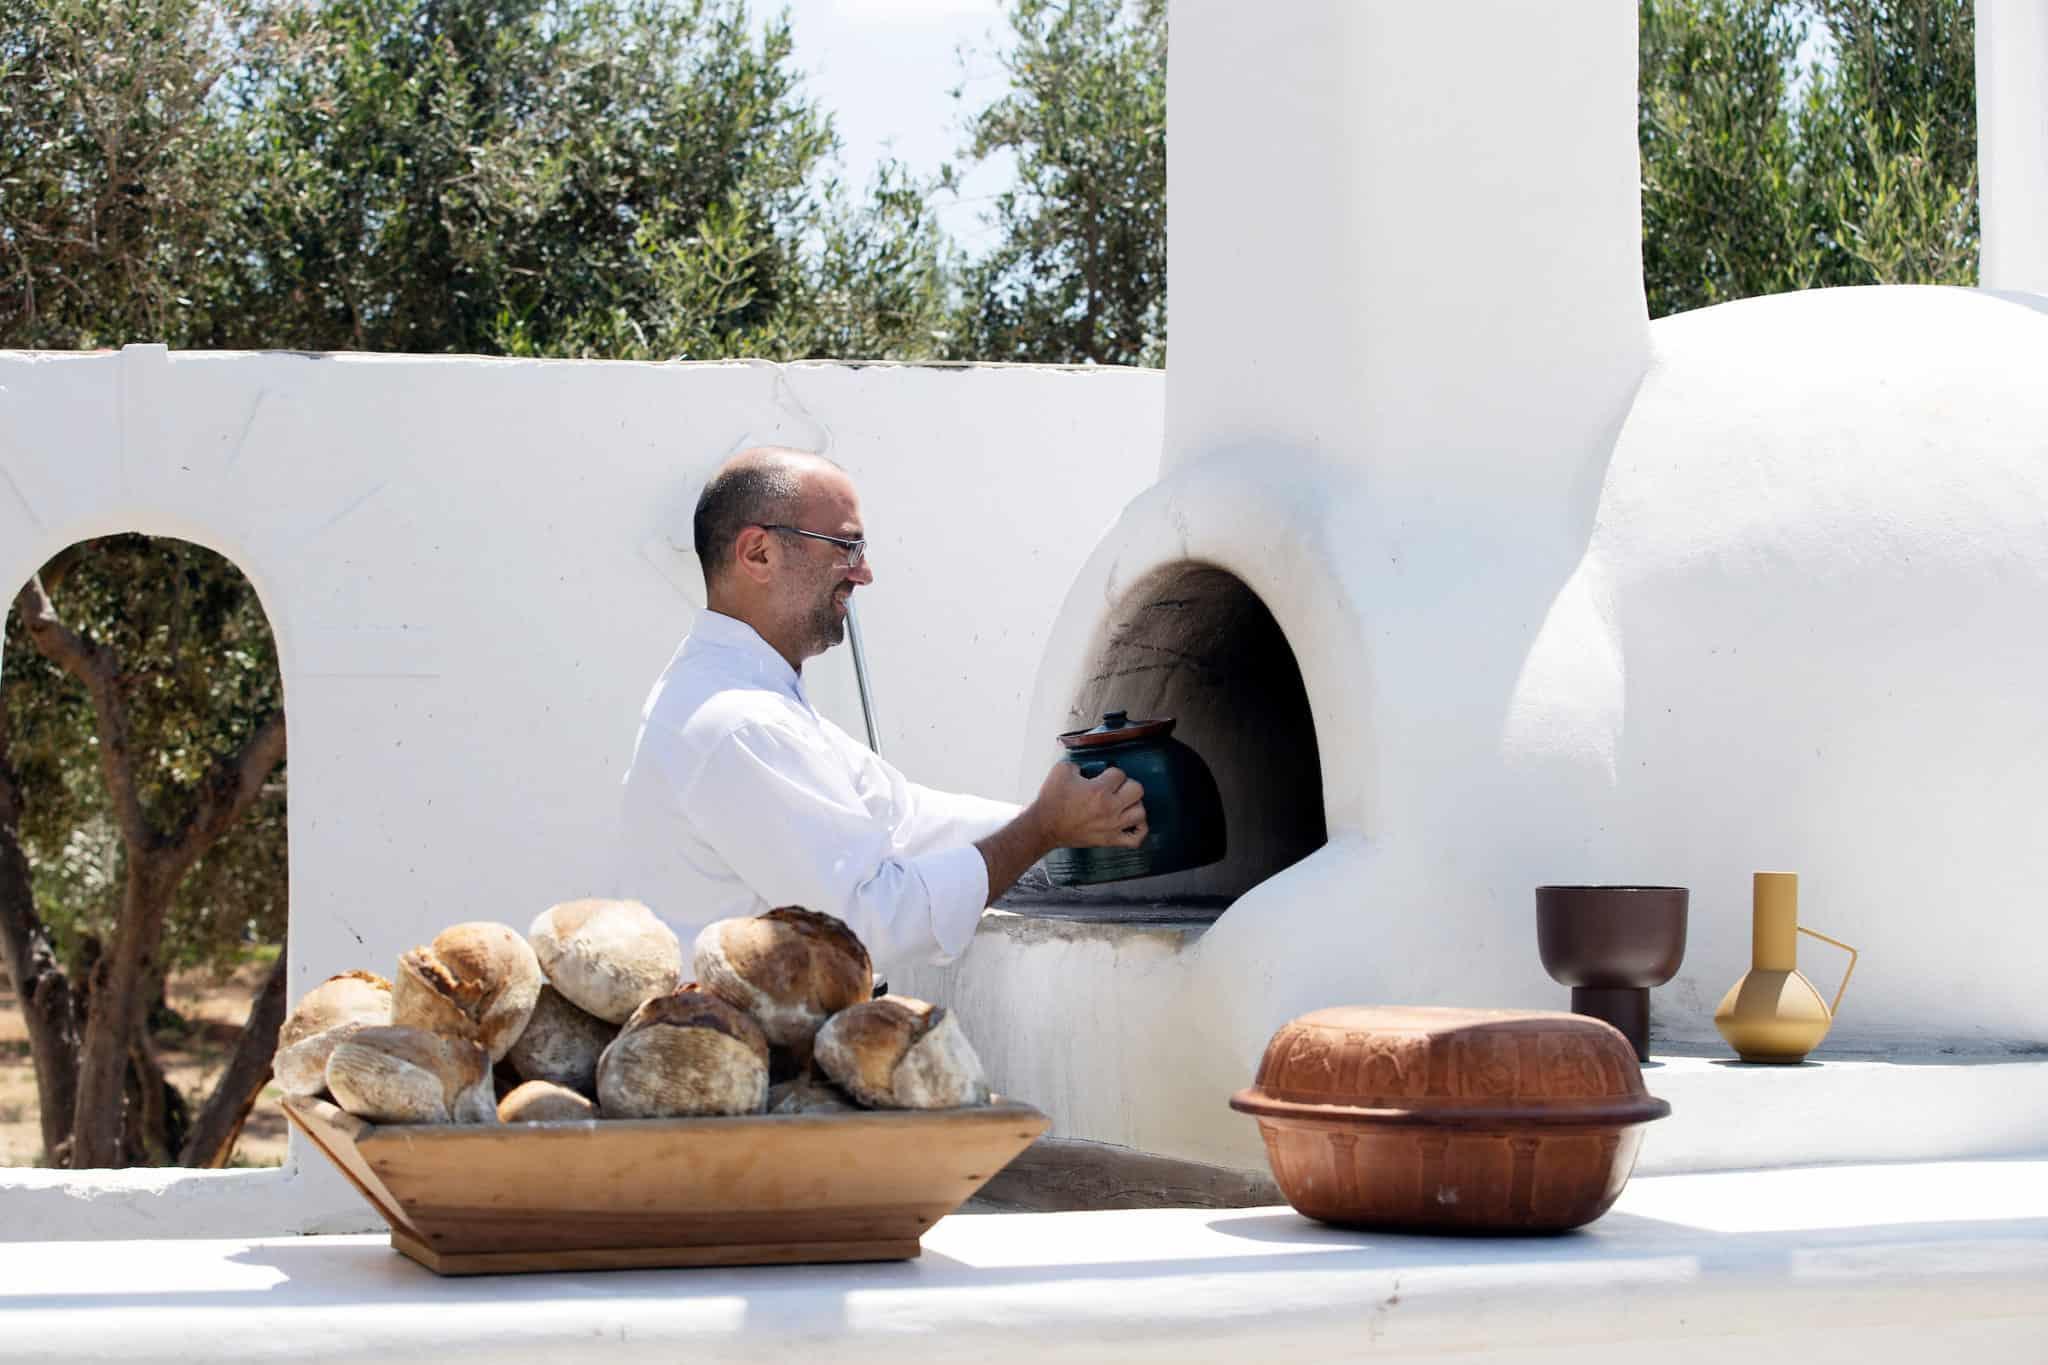 Bread making in Paros Greece, SALT Excursion